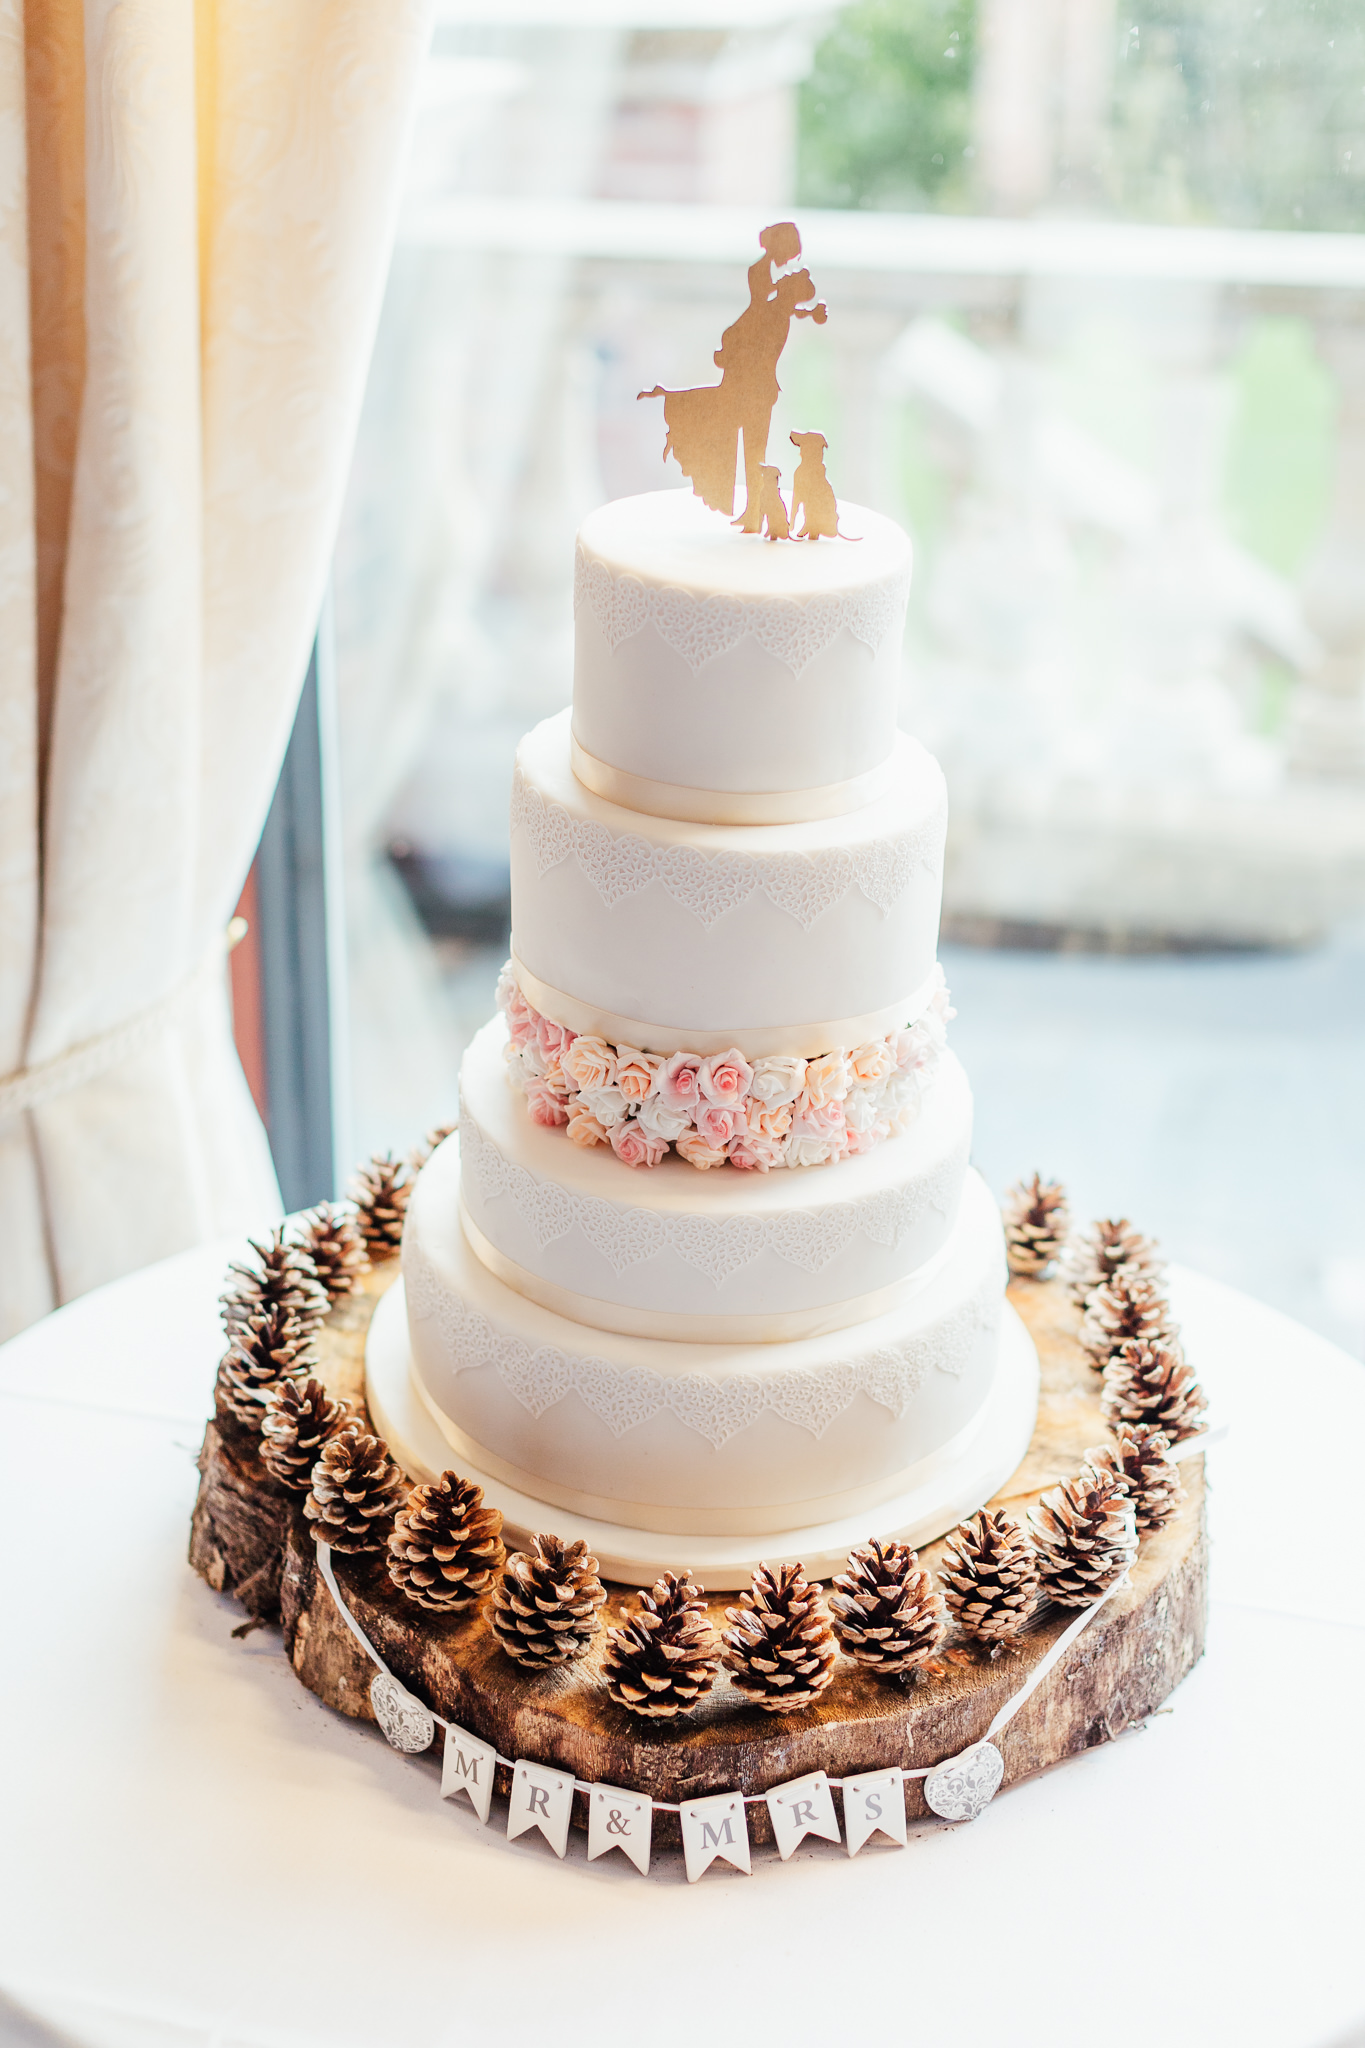 Willington-Hall-Cheshire-Wedding-28.jpg